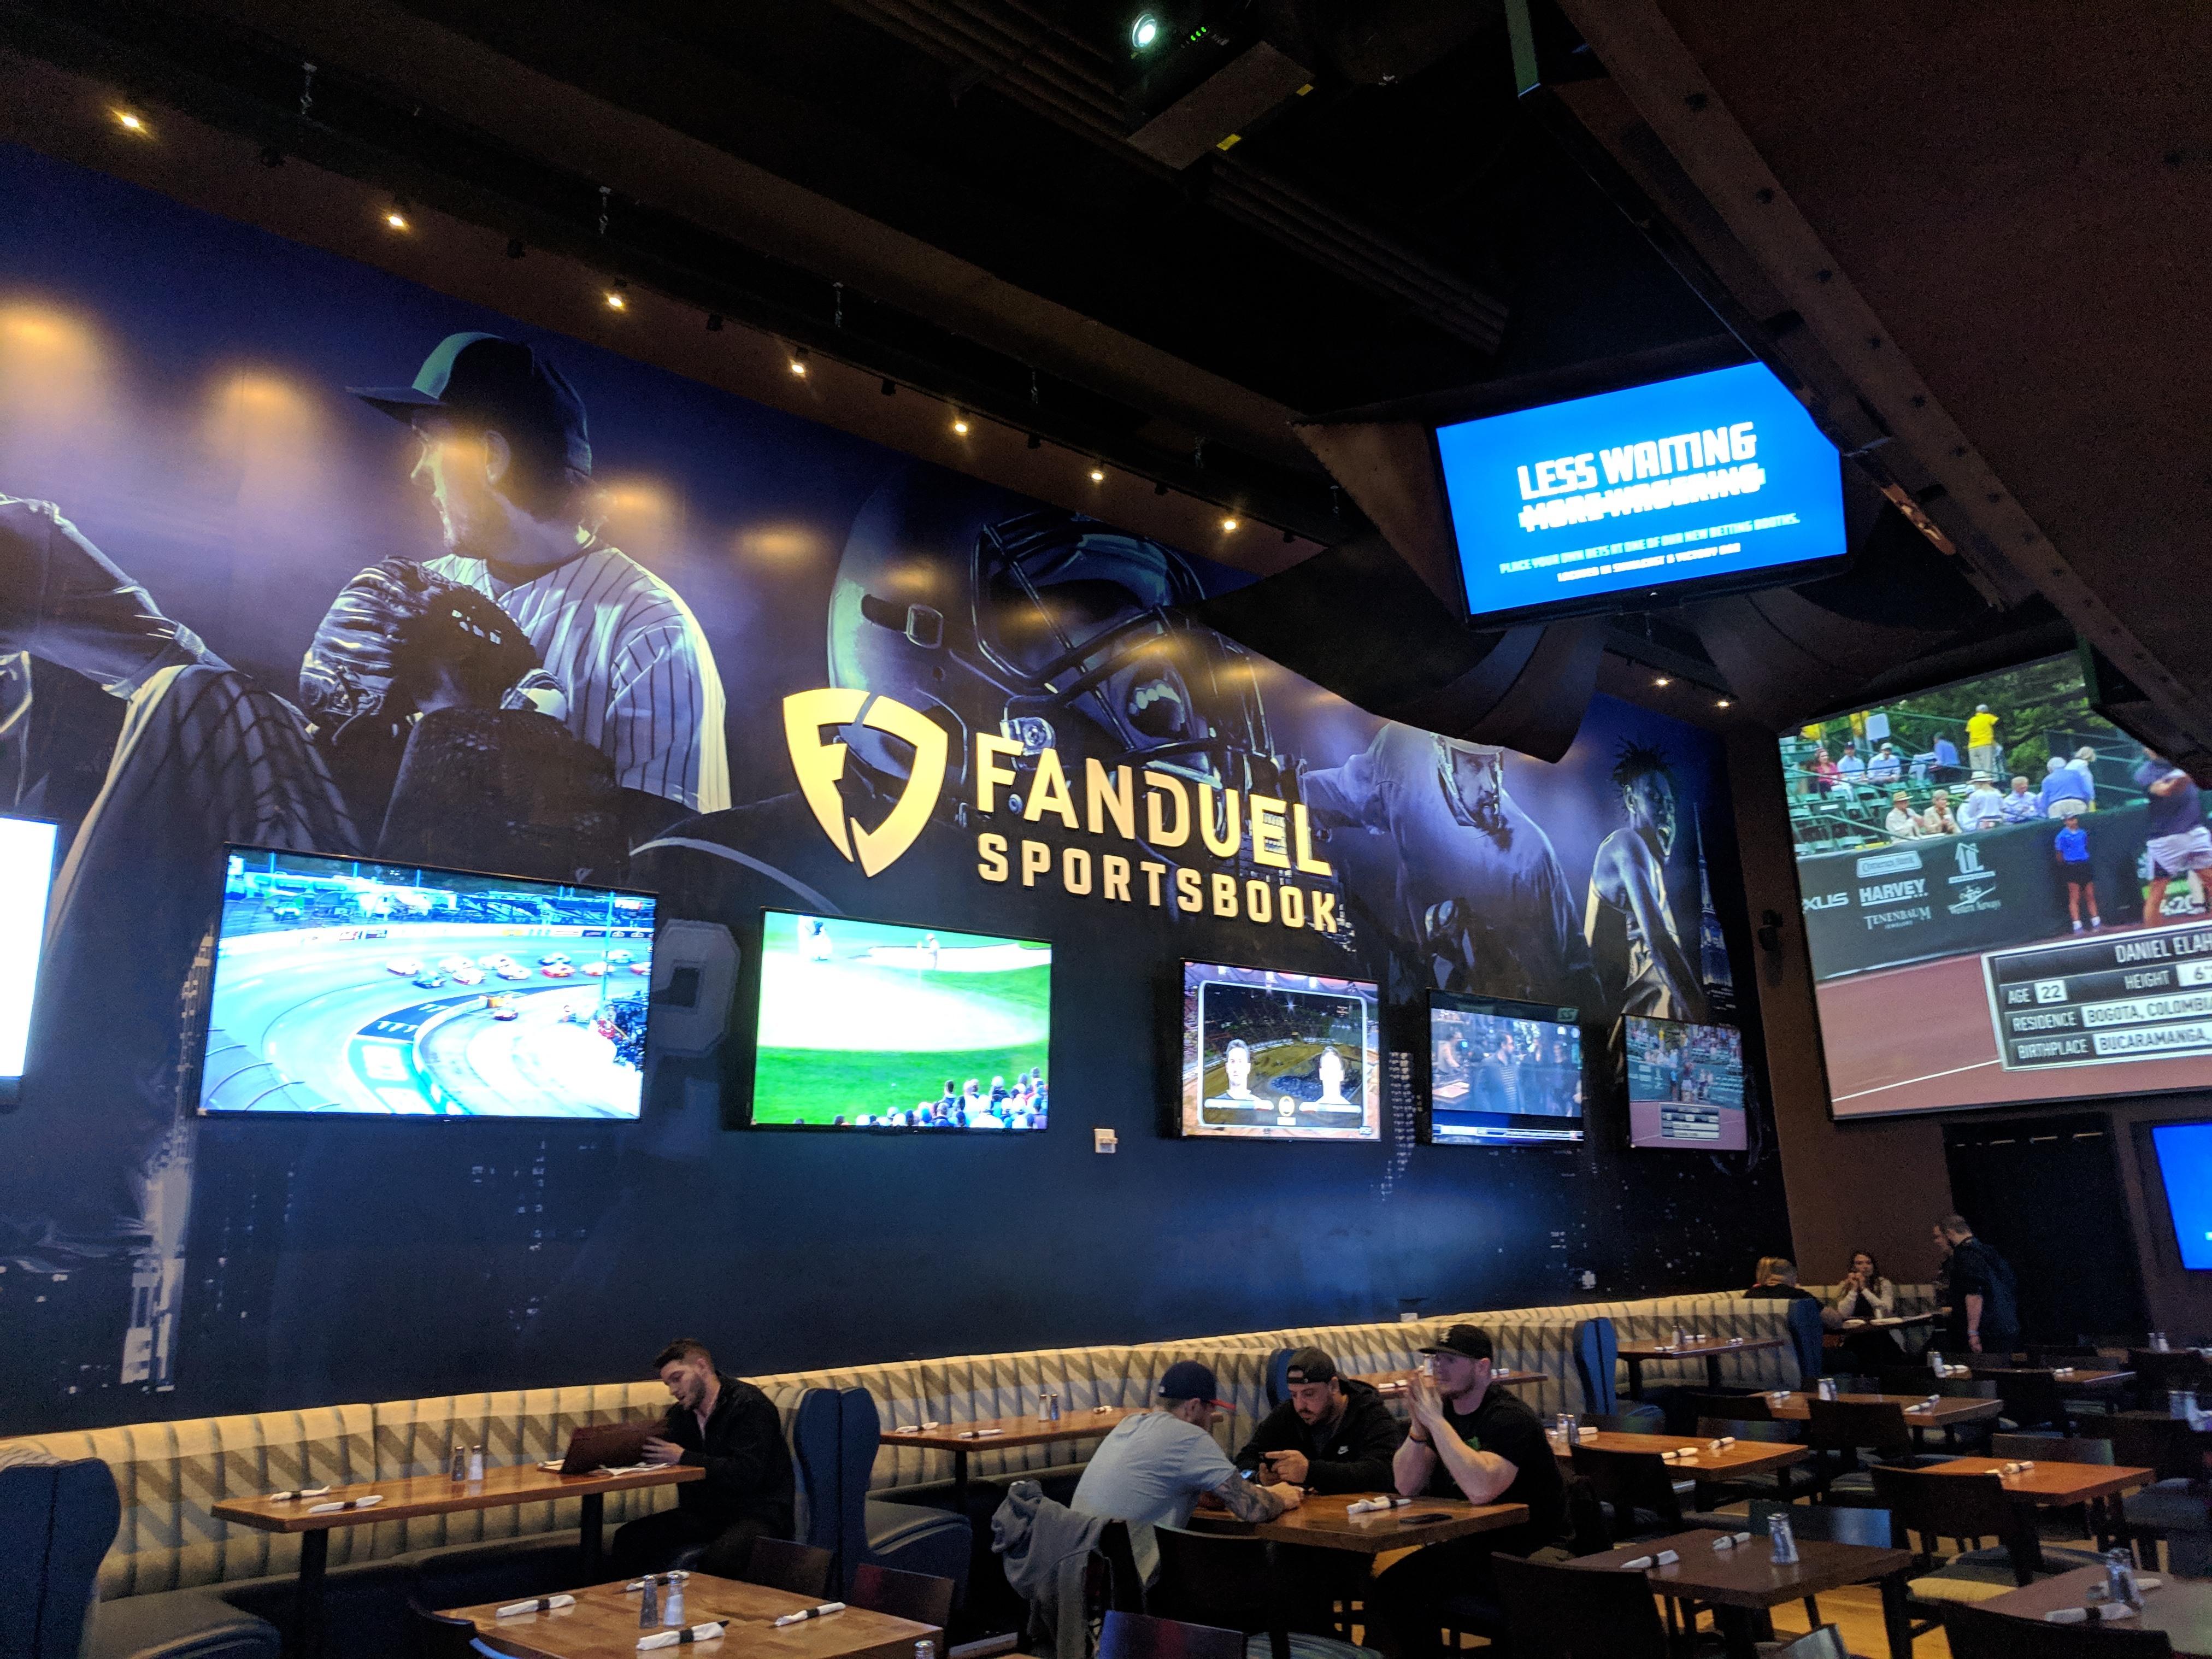 FanDuel live sports streaming